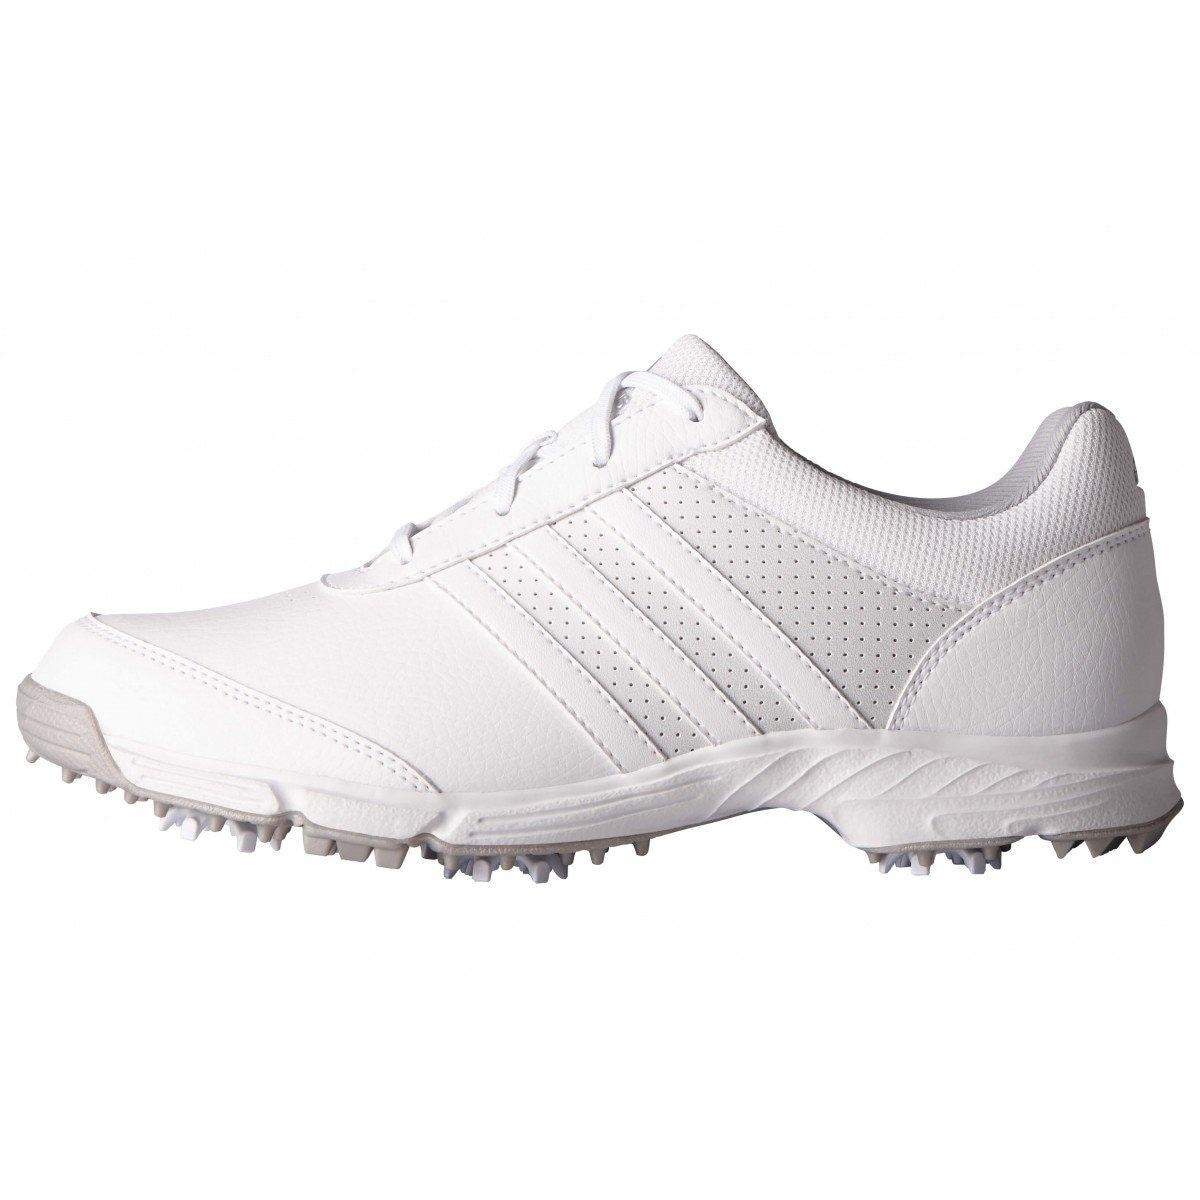 Shop New Adidas Women S Tech Response White White Matte Silver Golf Shoes Q44708 Overstock 25723842